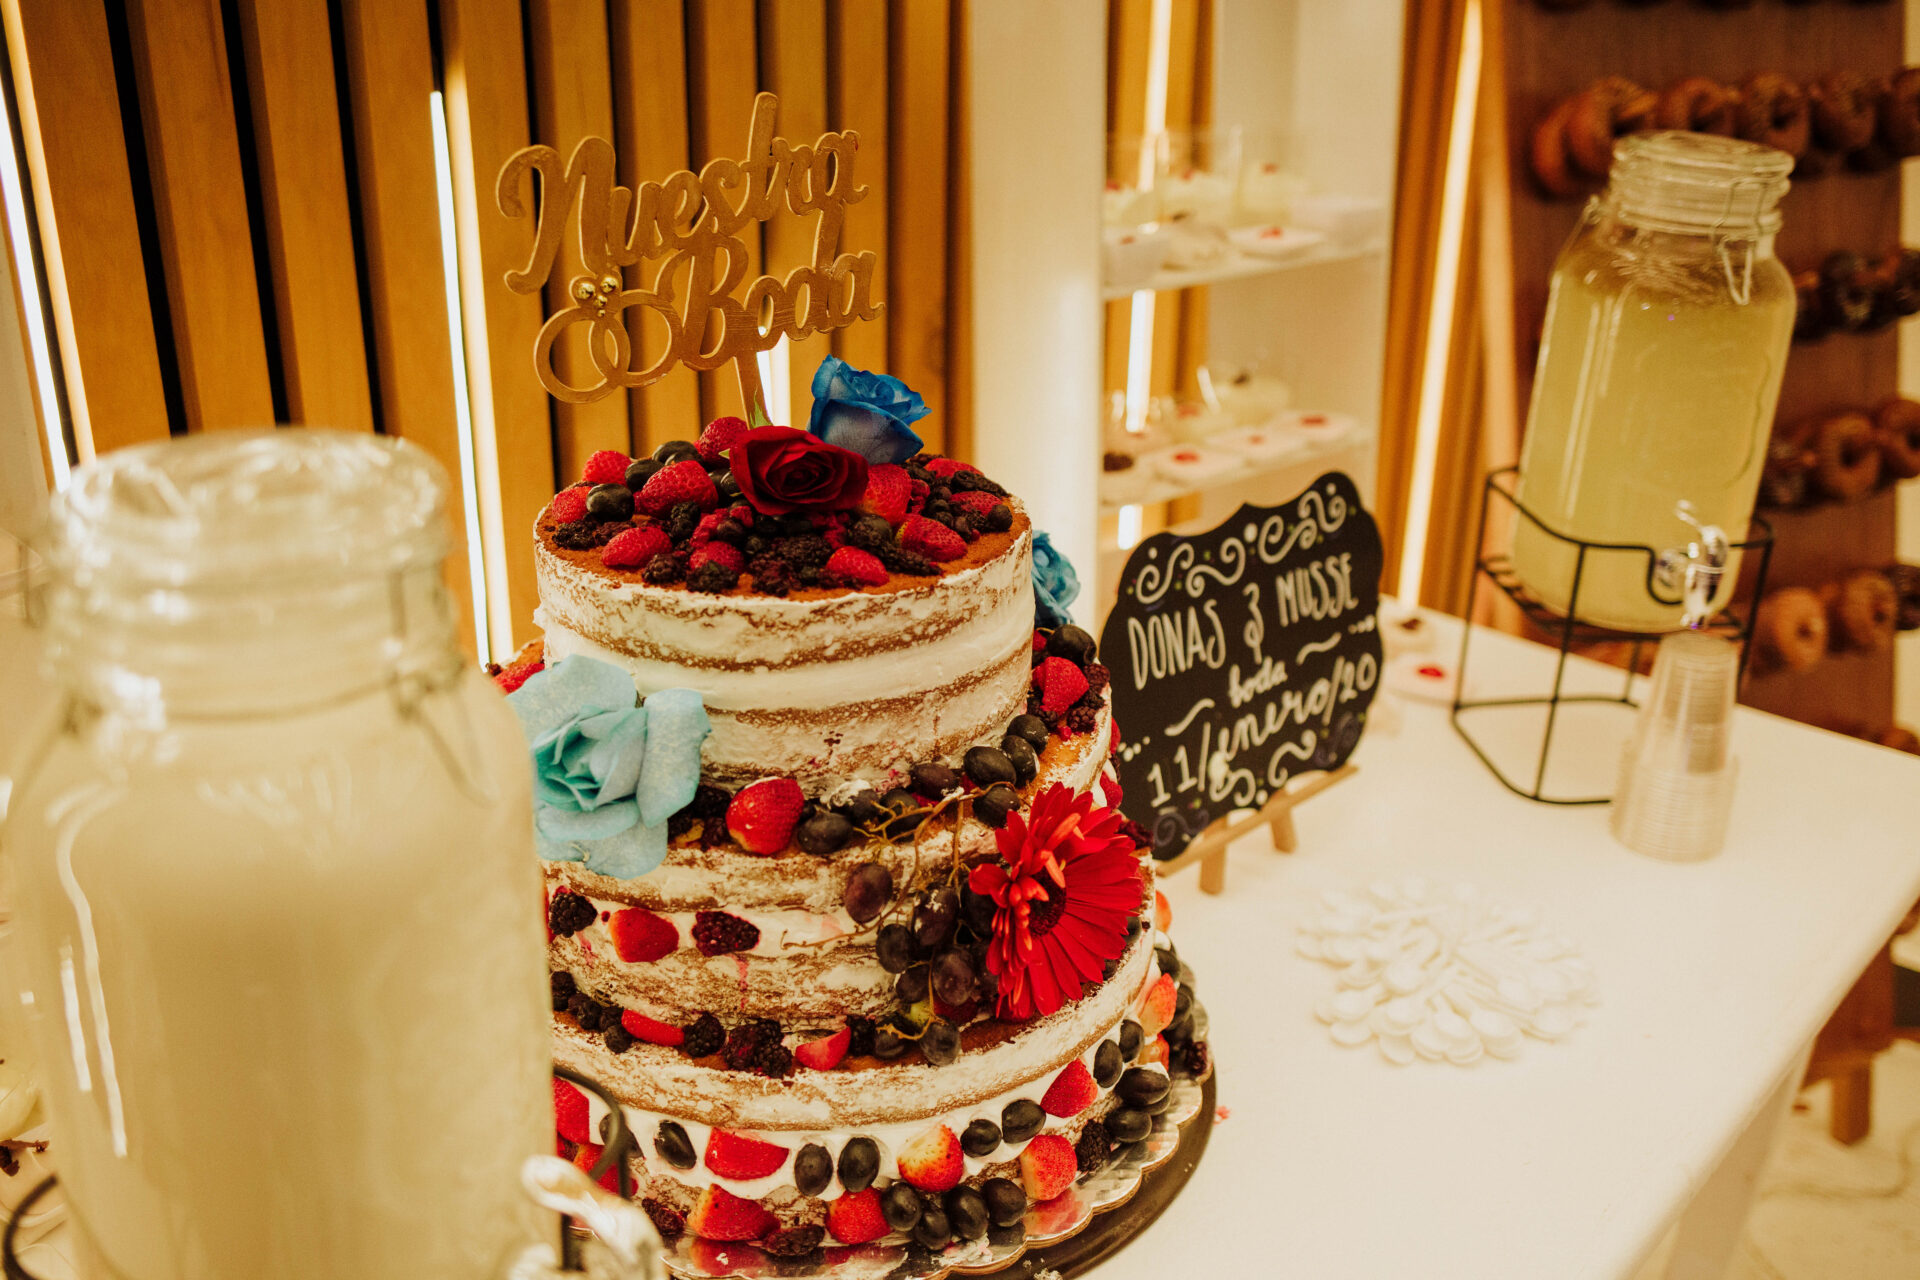 javier_noriega_fotografo_bodas_gaviones_zacatecas_wedding_photographer30